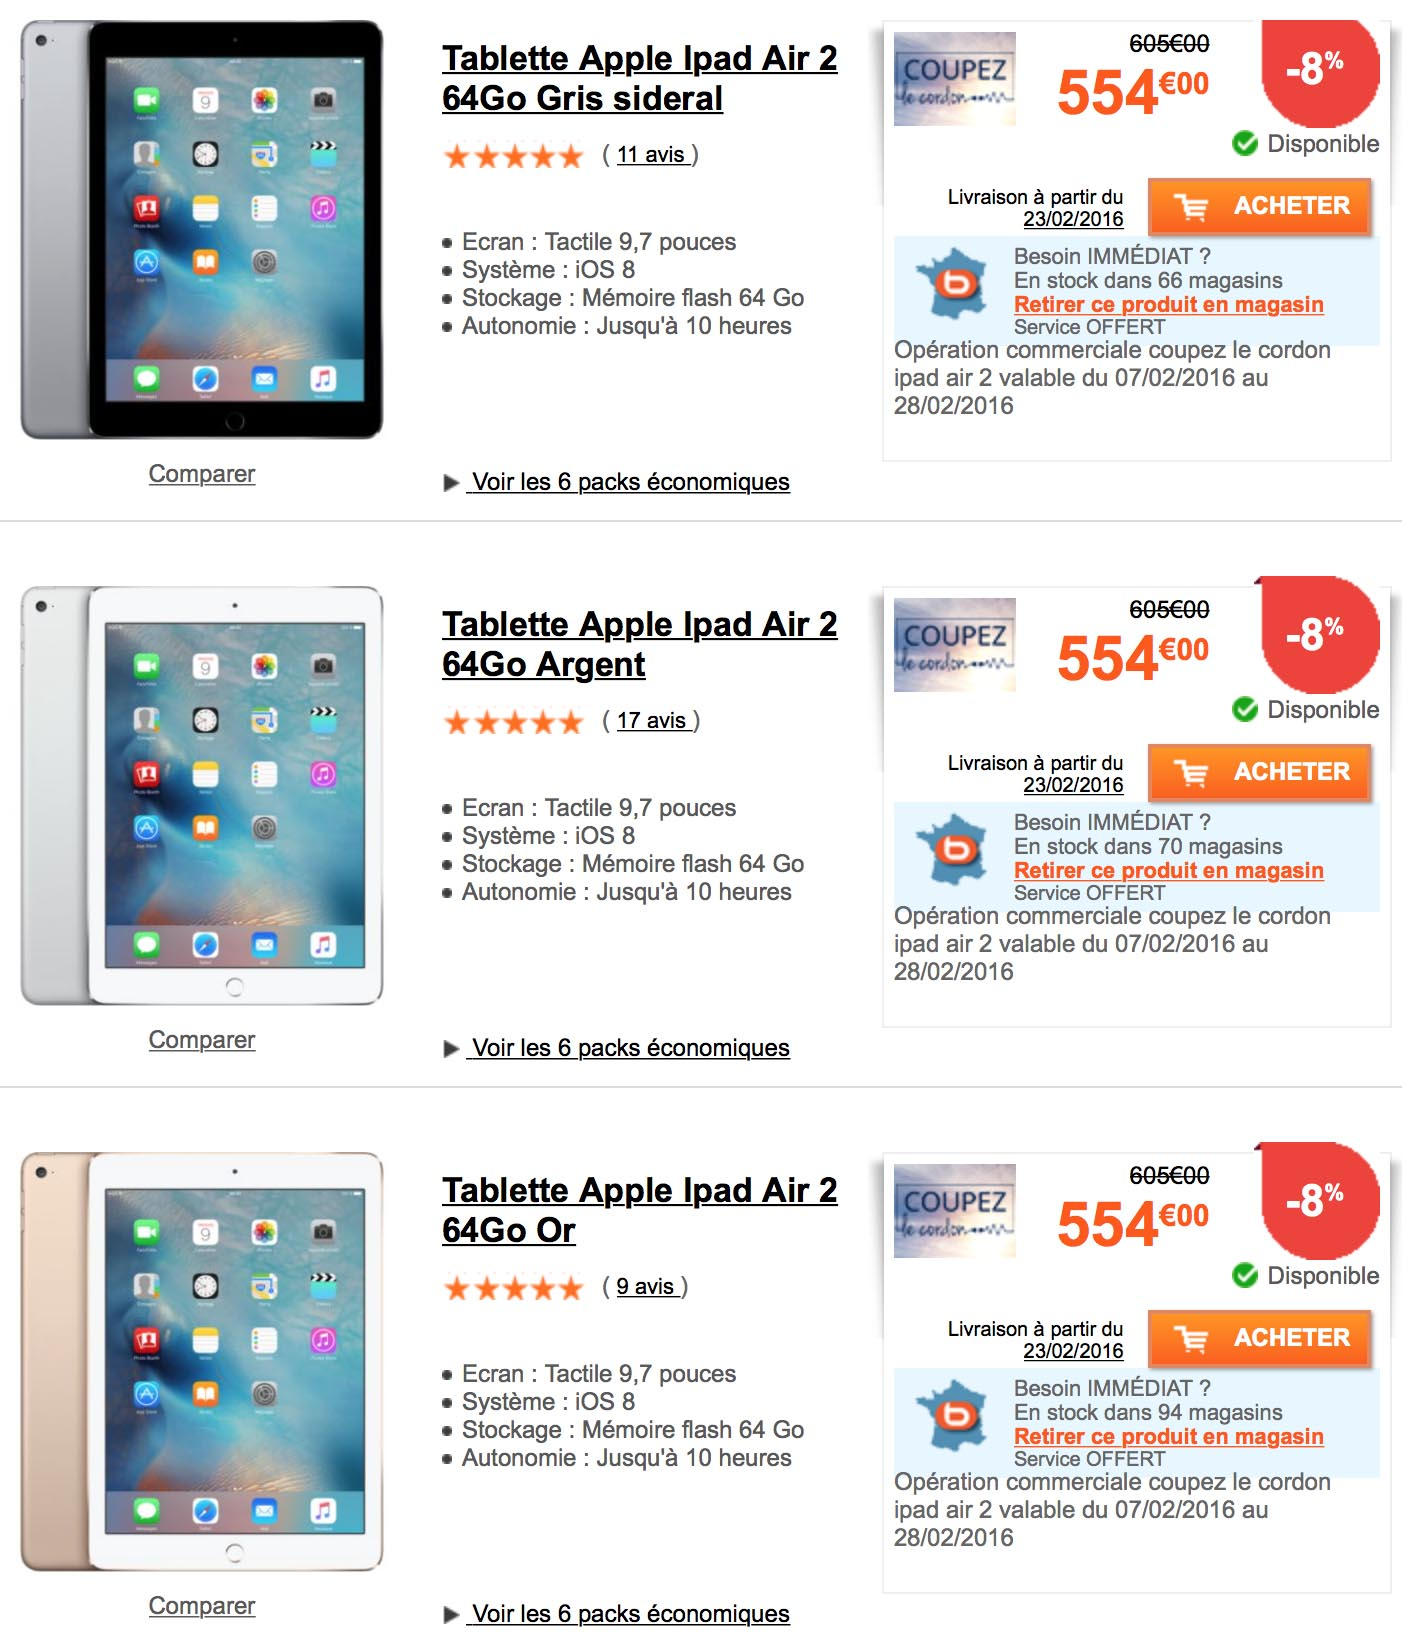 iPad Air 2 Boulanger